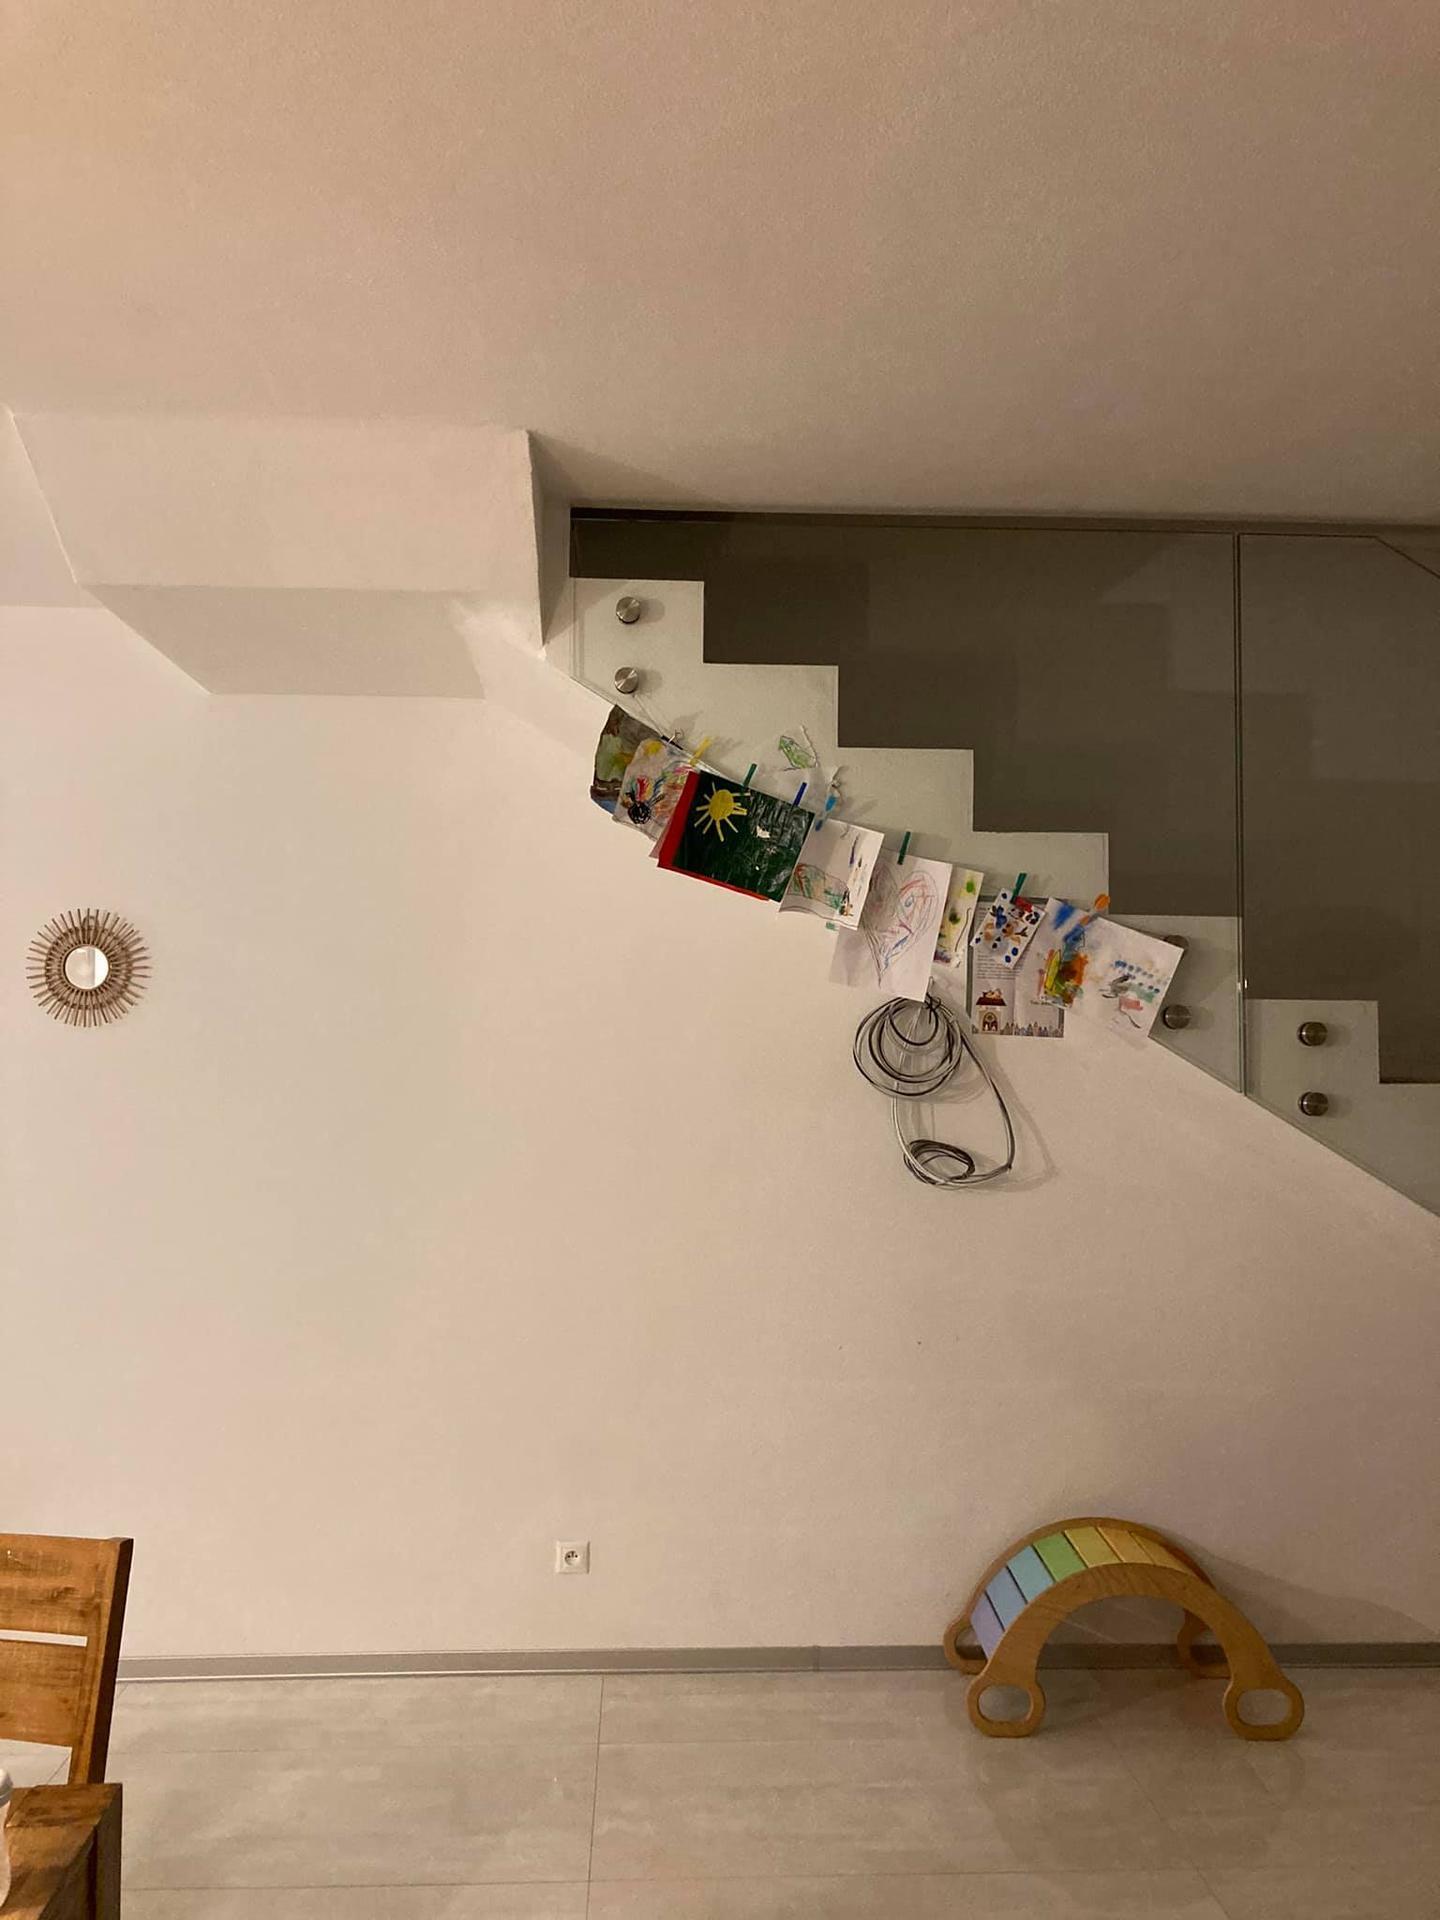 Ahojte,  developer našu obývačku nadizajnoval... - Obrázok č. 1